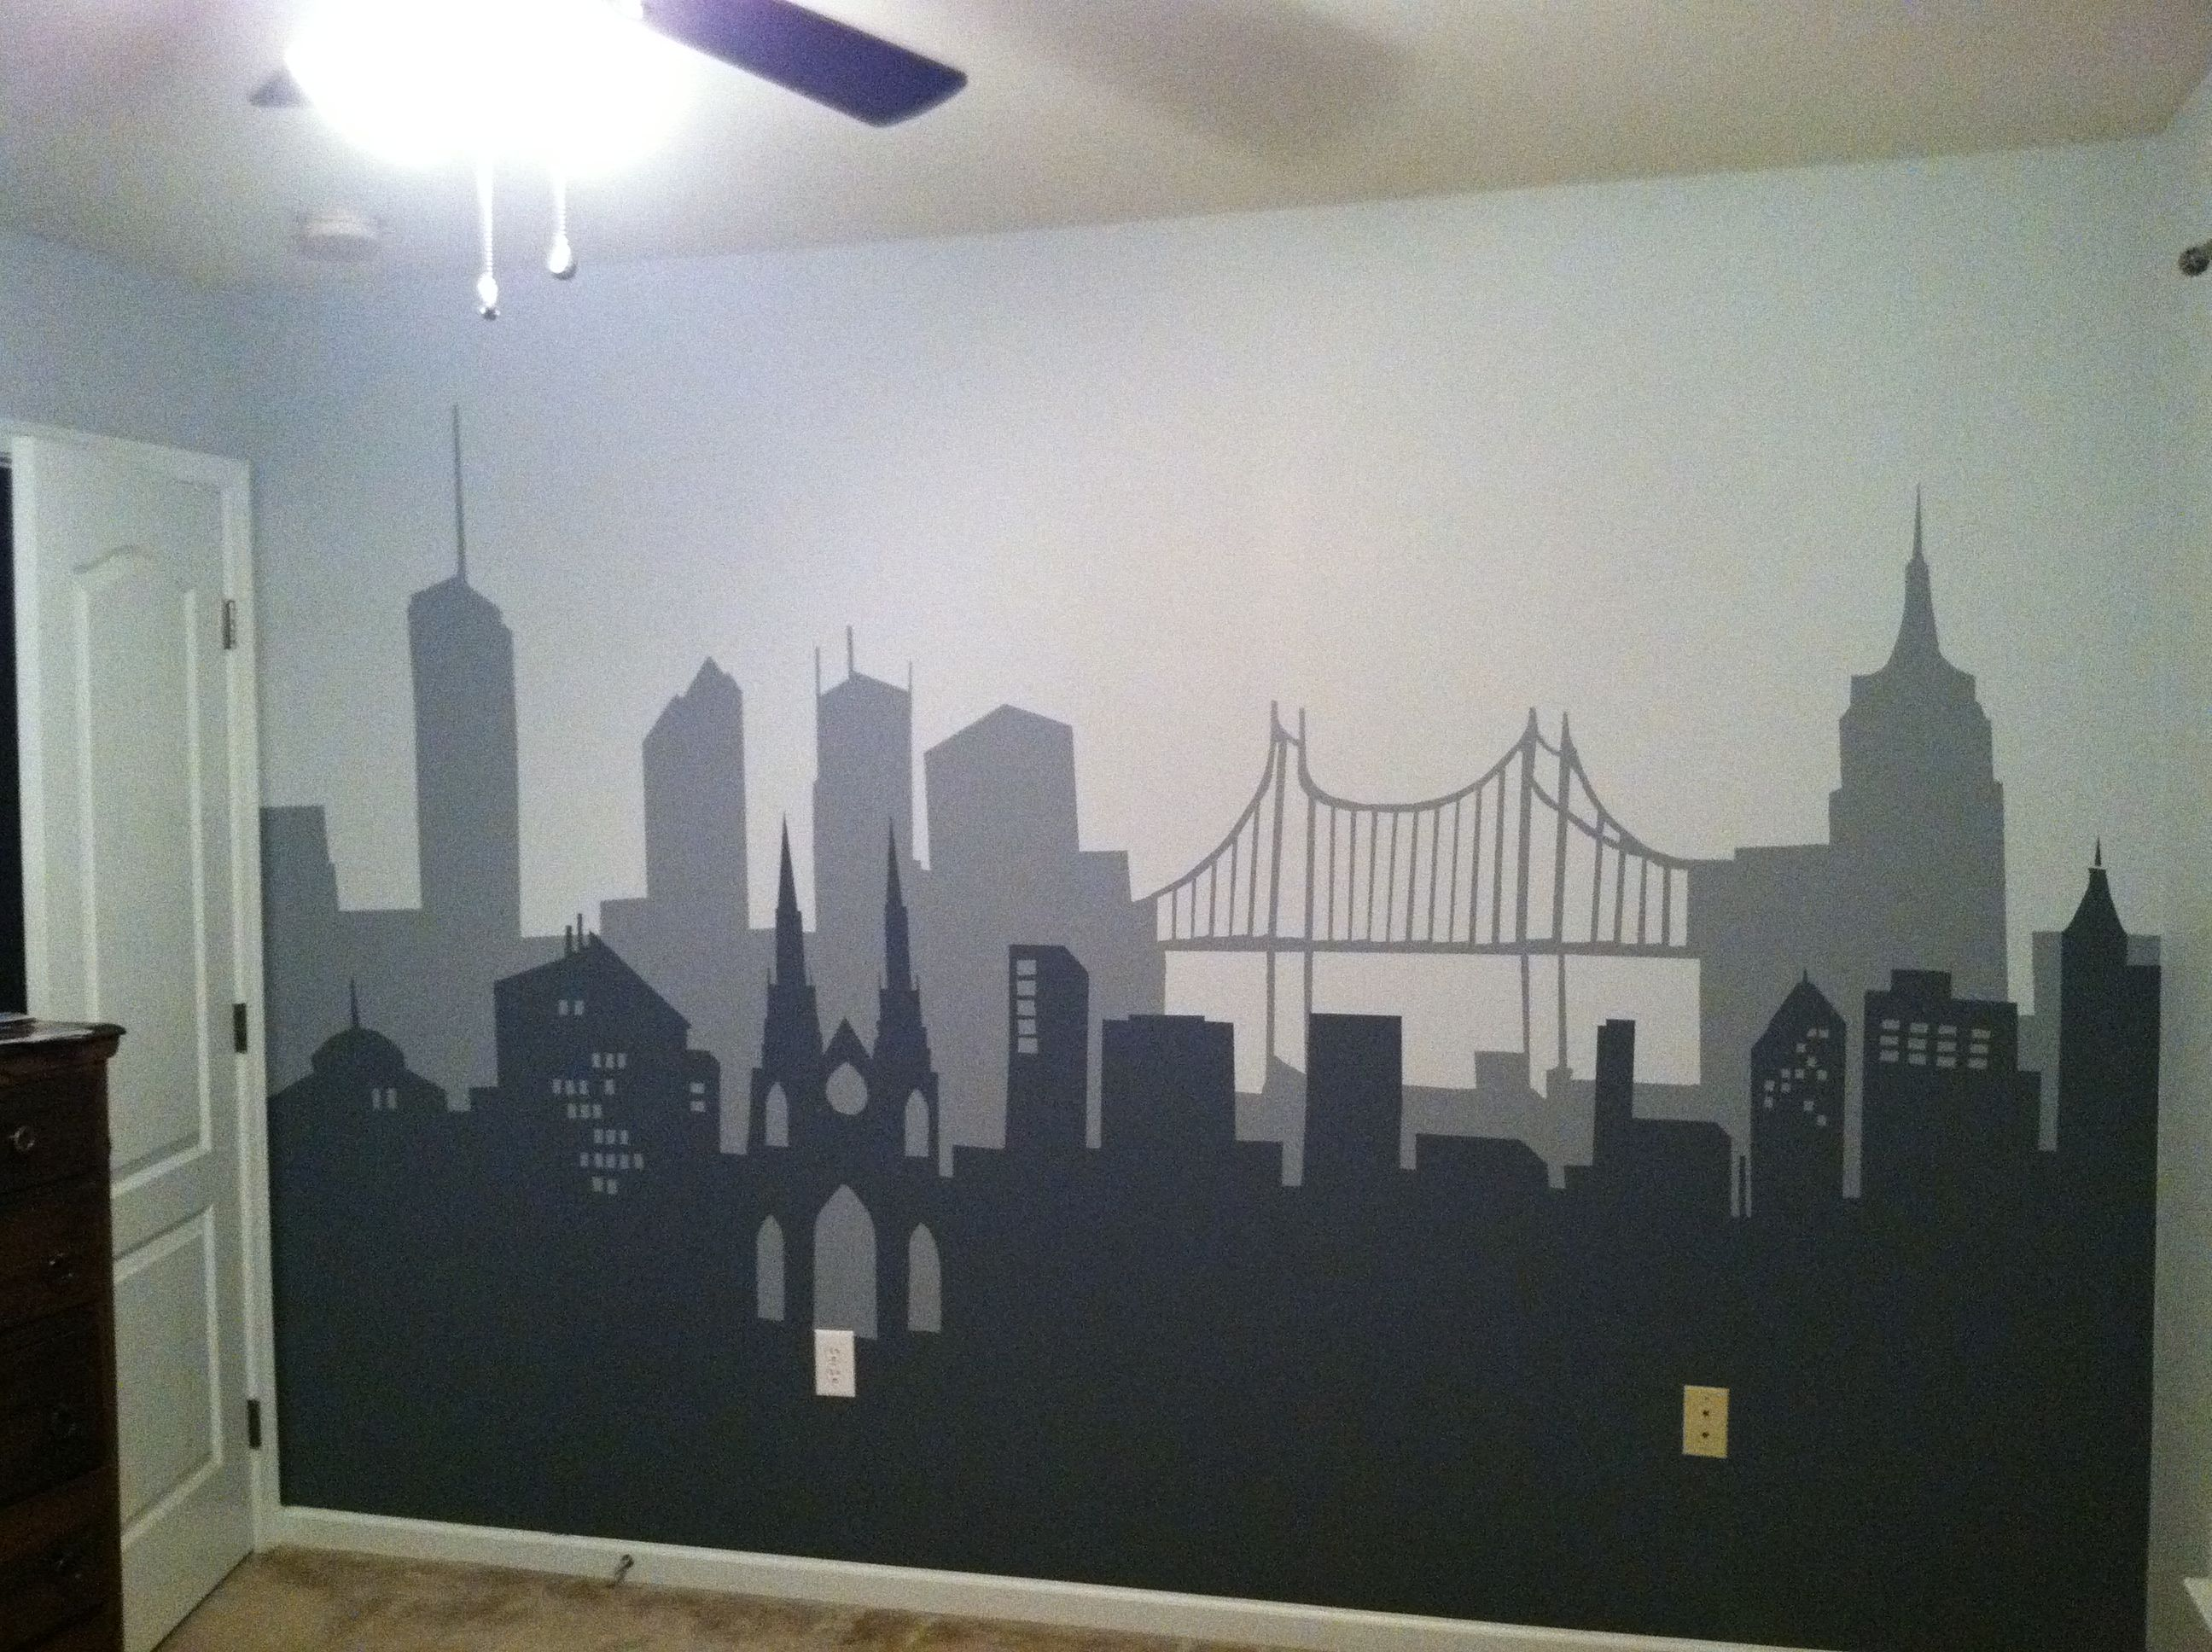 Bat Stars wall art vinyl decal sticker City Silhouette